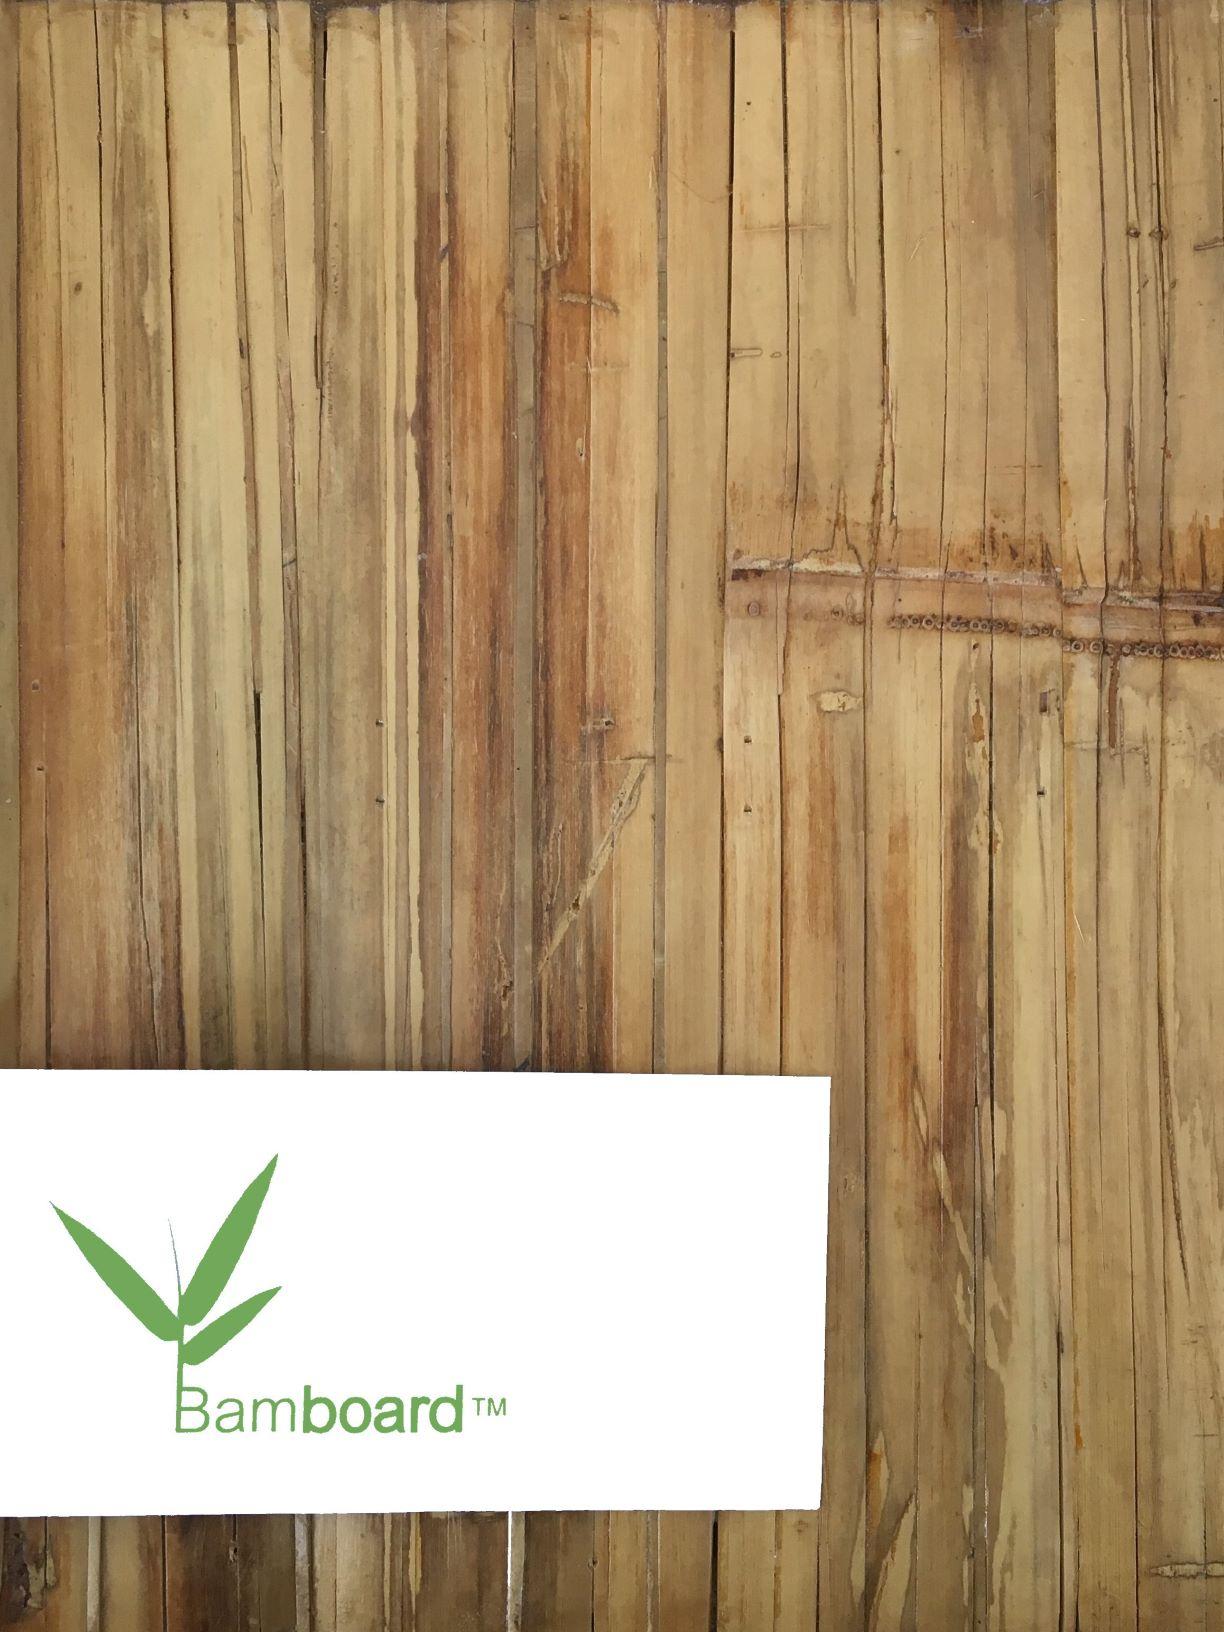 Bamboard (interior) sm.jpg